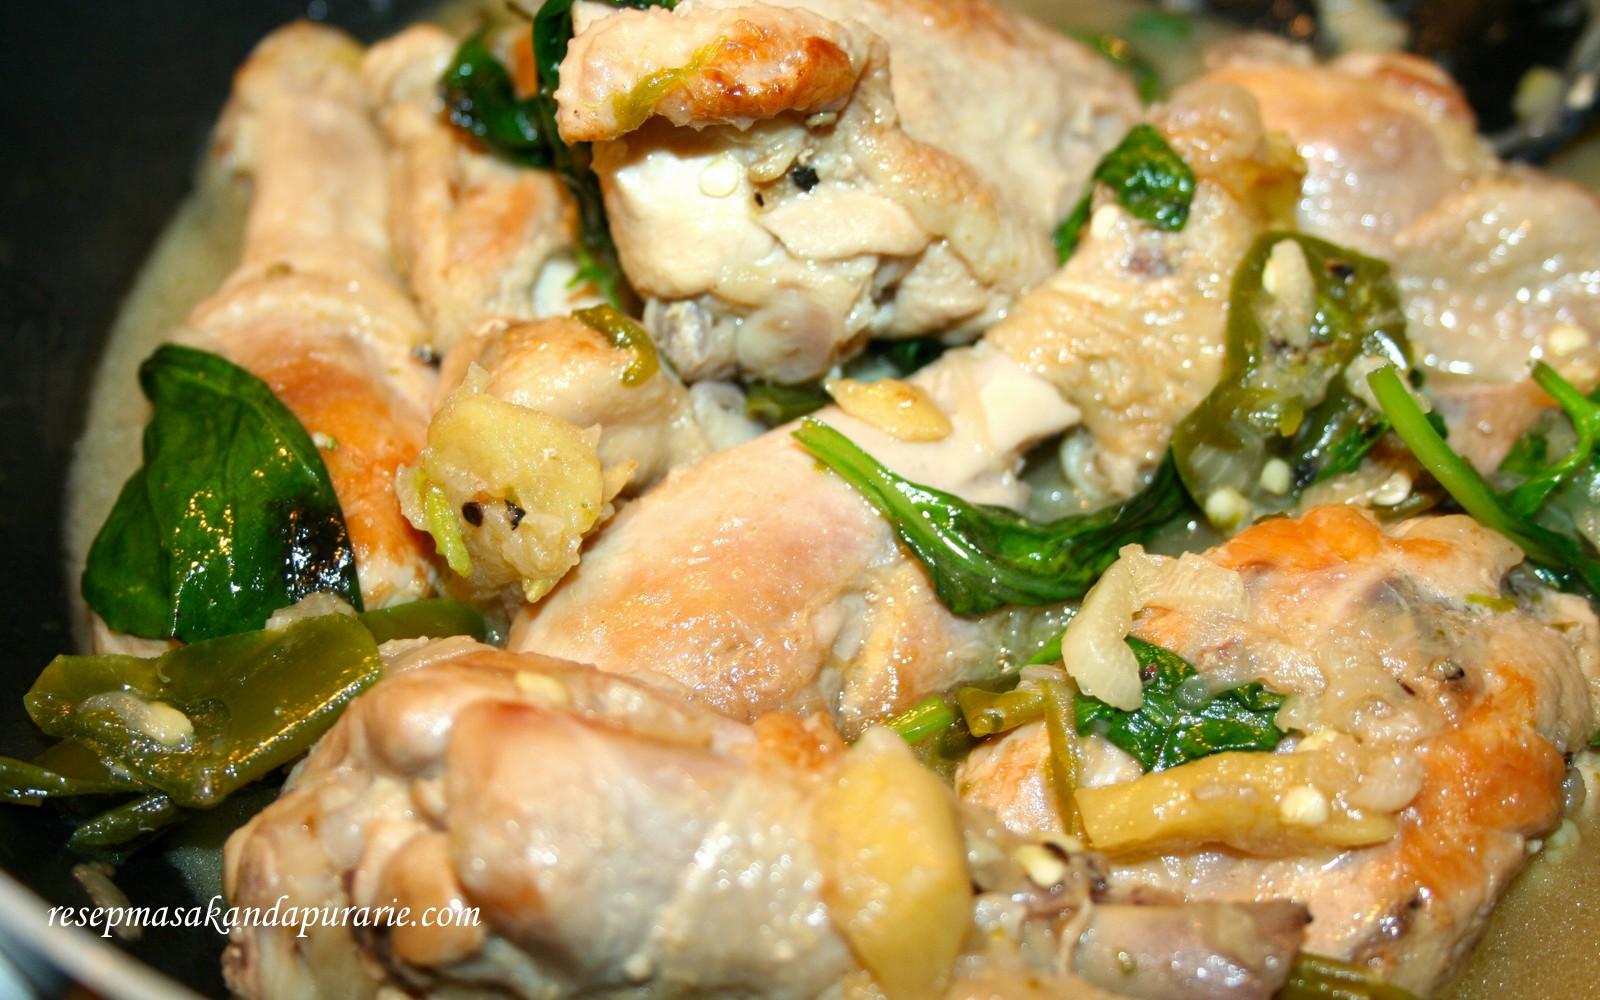 Resep Ayam Kemangi ala Bu Icha - Resep Masakan Dapur Arie